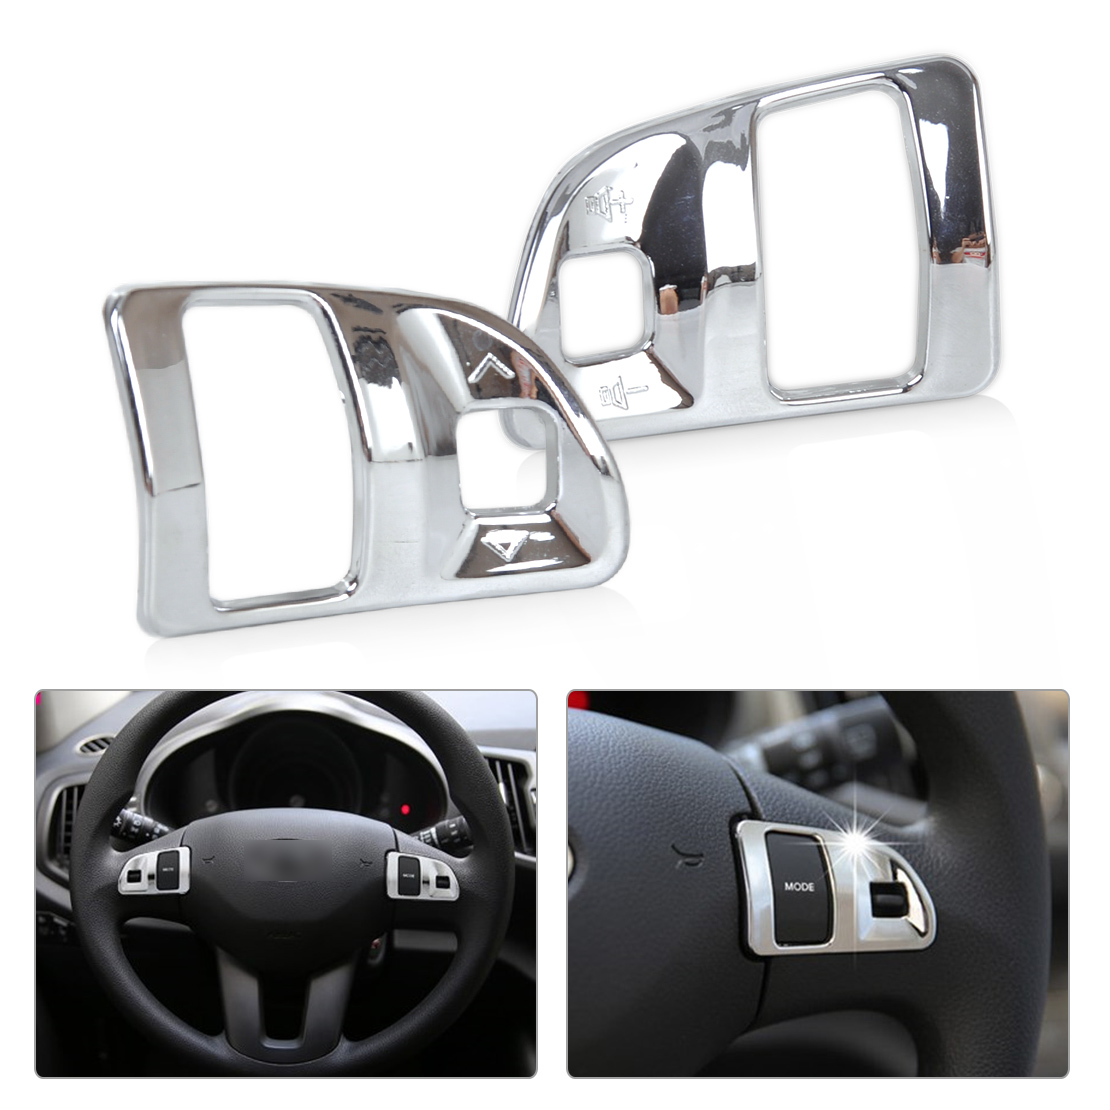 beler 2pcs Silver ABS Chrome Steering Wheel Molding Cover Trim for Kia Sportage R 2011 2012 2013 2014 2015